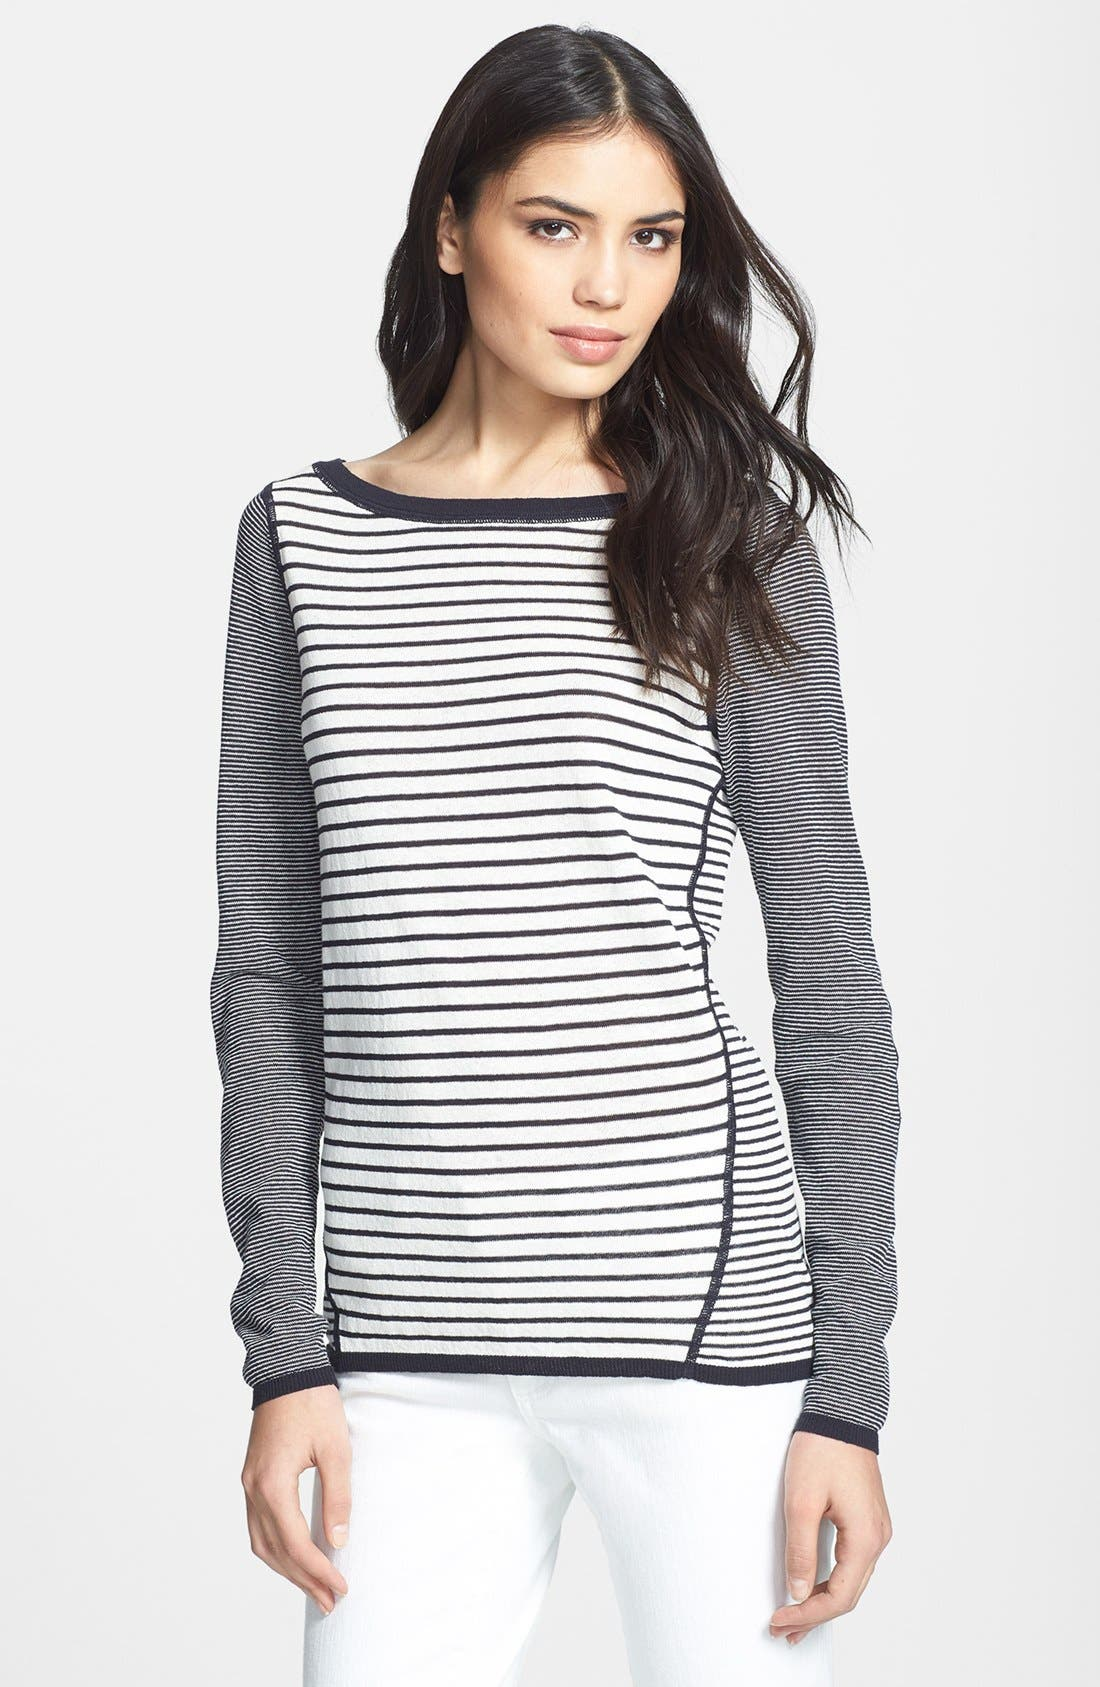 Main Image - Tory Burch 'Kamila' Mixed Stripe Sweater